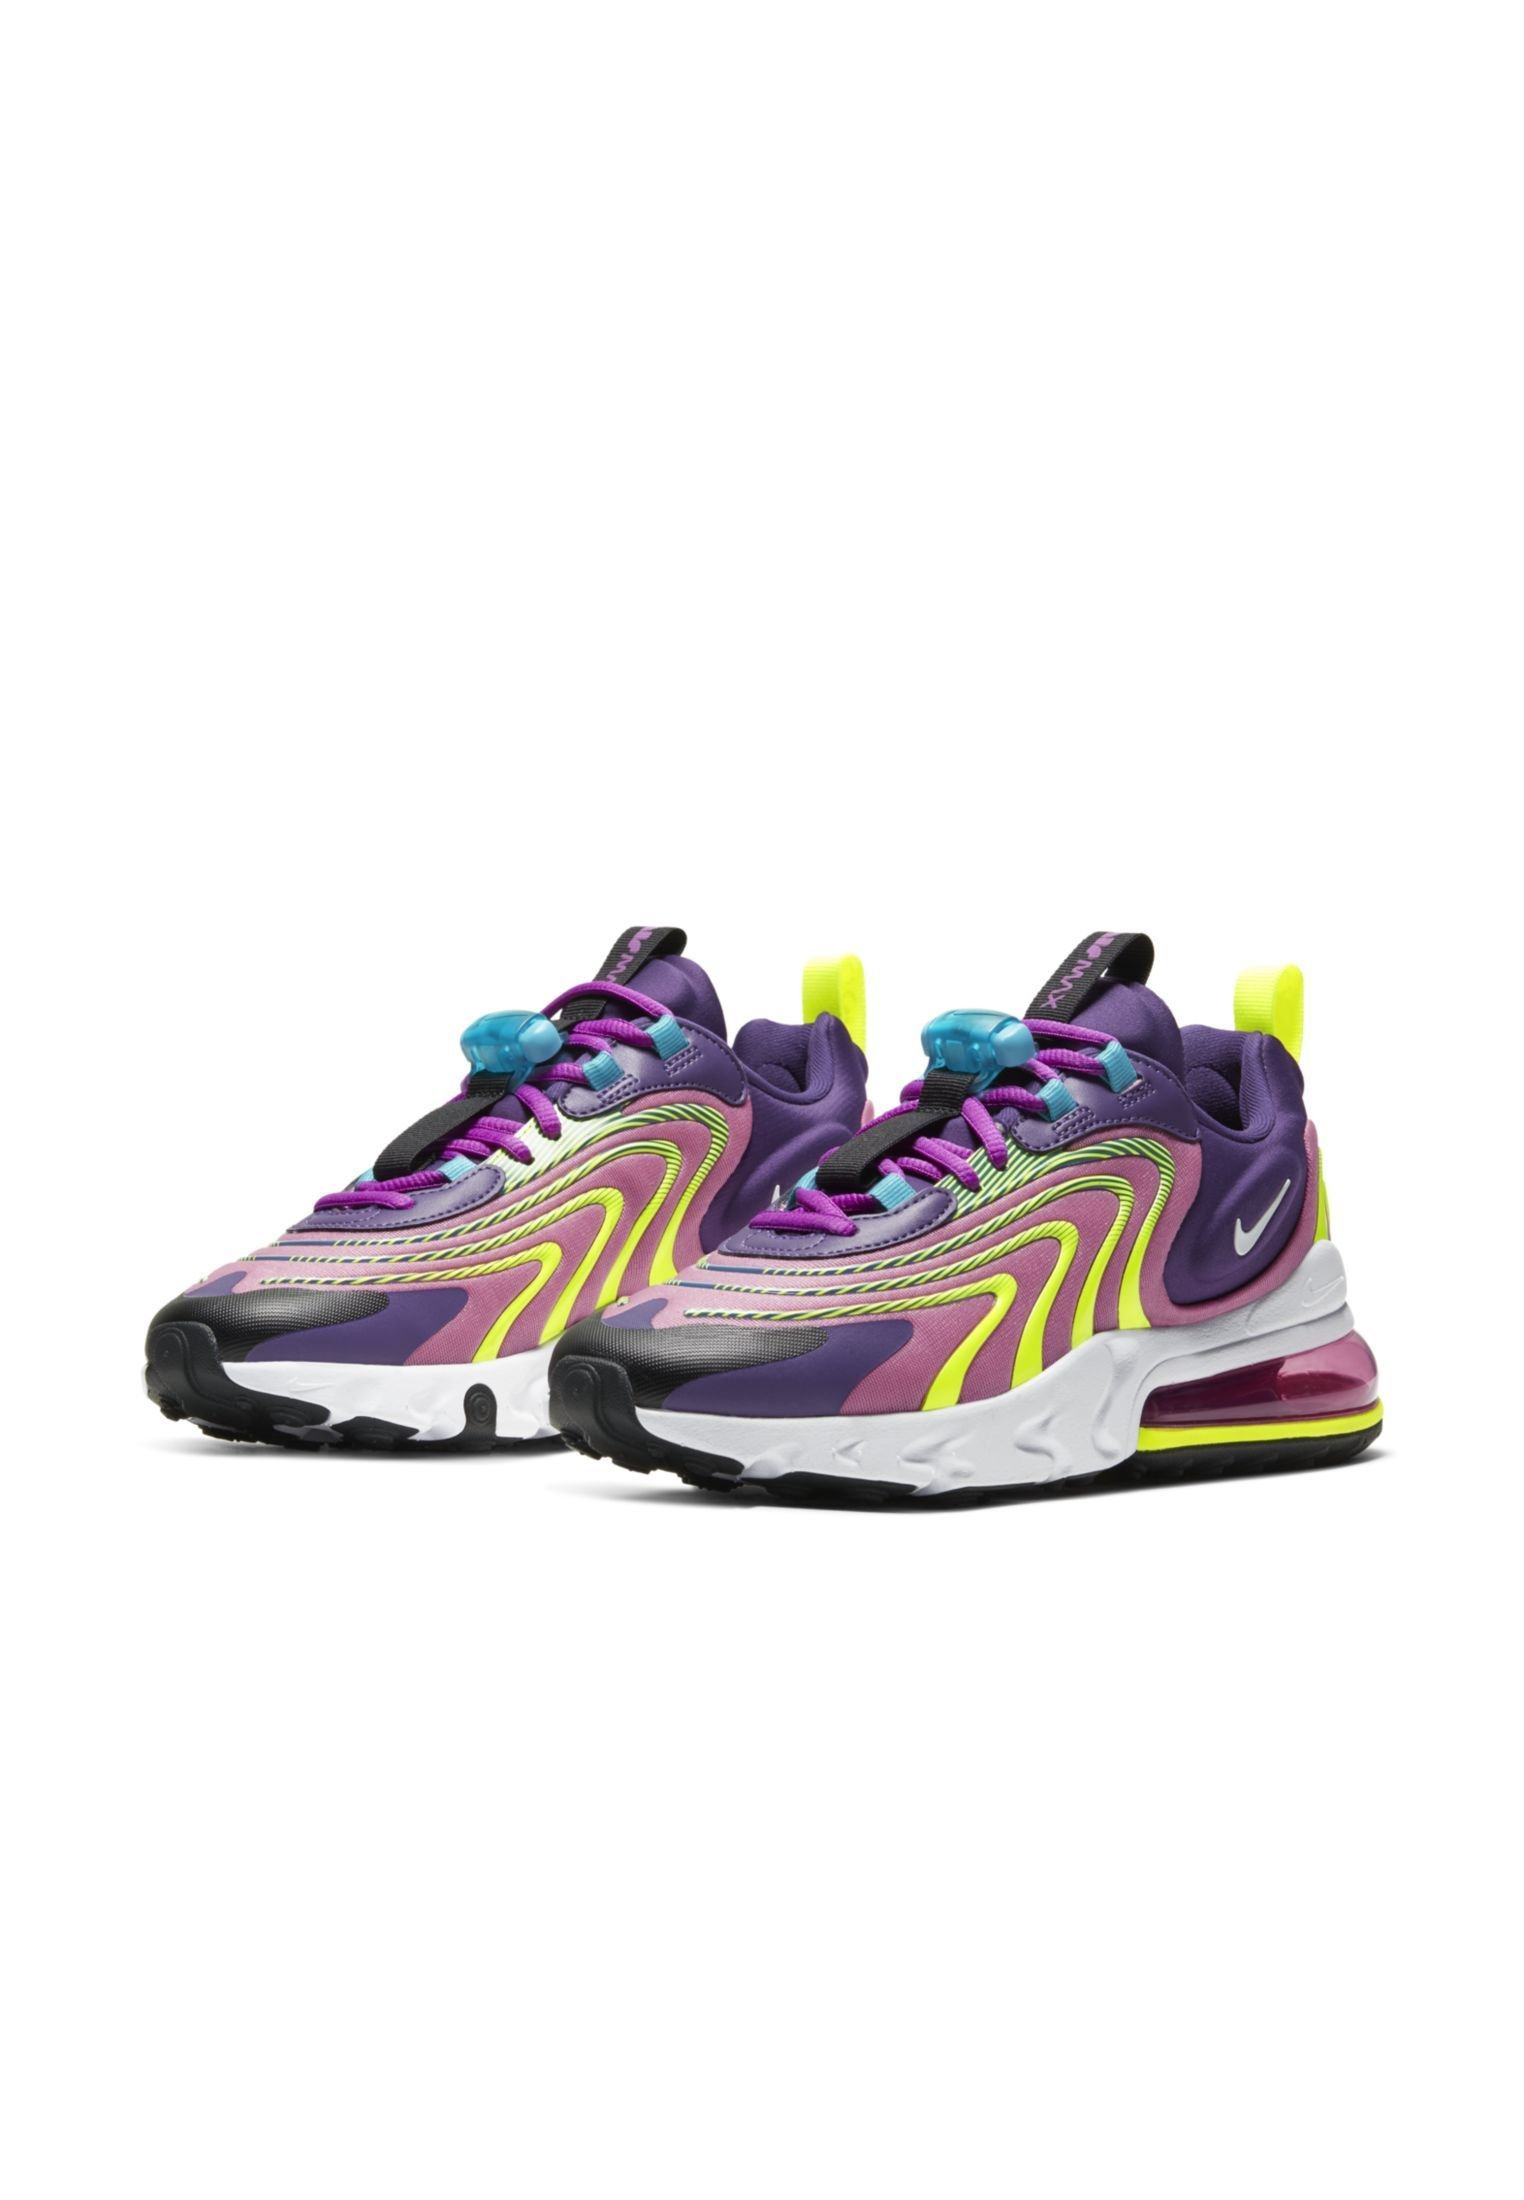 Nike Sportswear Air Max 270 React Eng Damenschuh - Sneakers Eggplant/magic Flamingo/vivid Purple/white